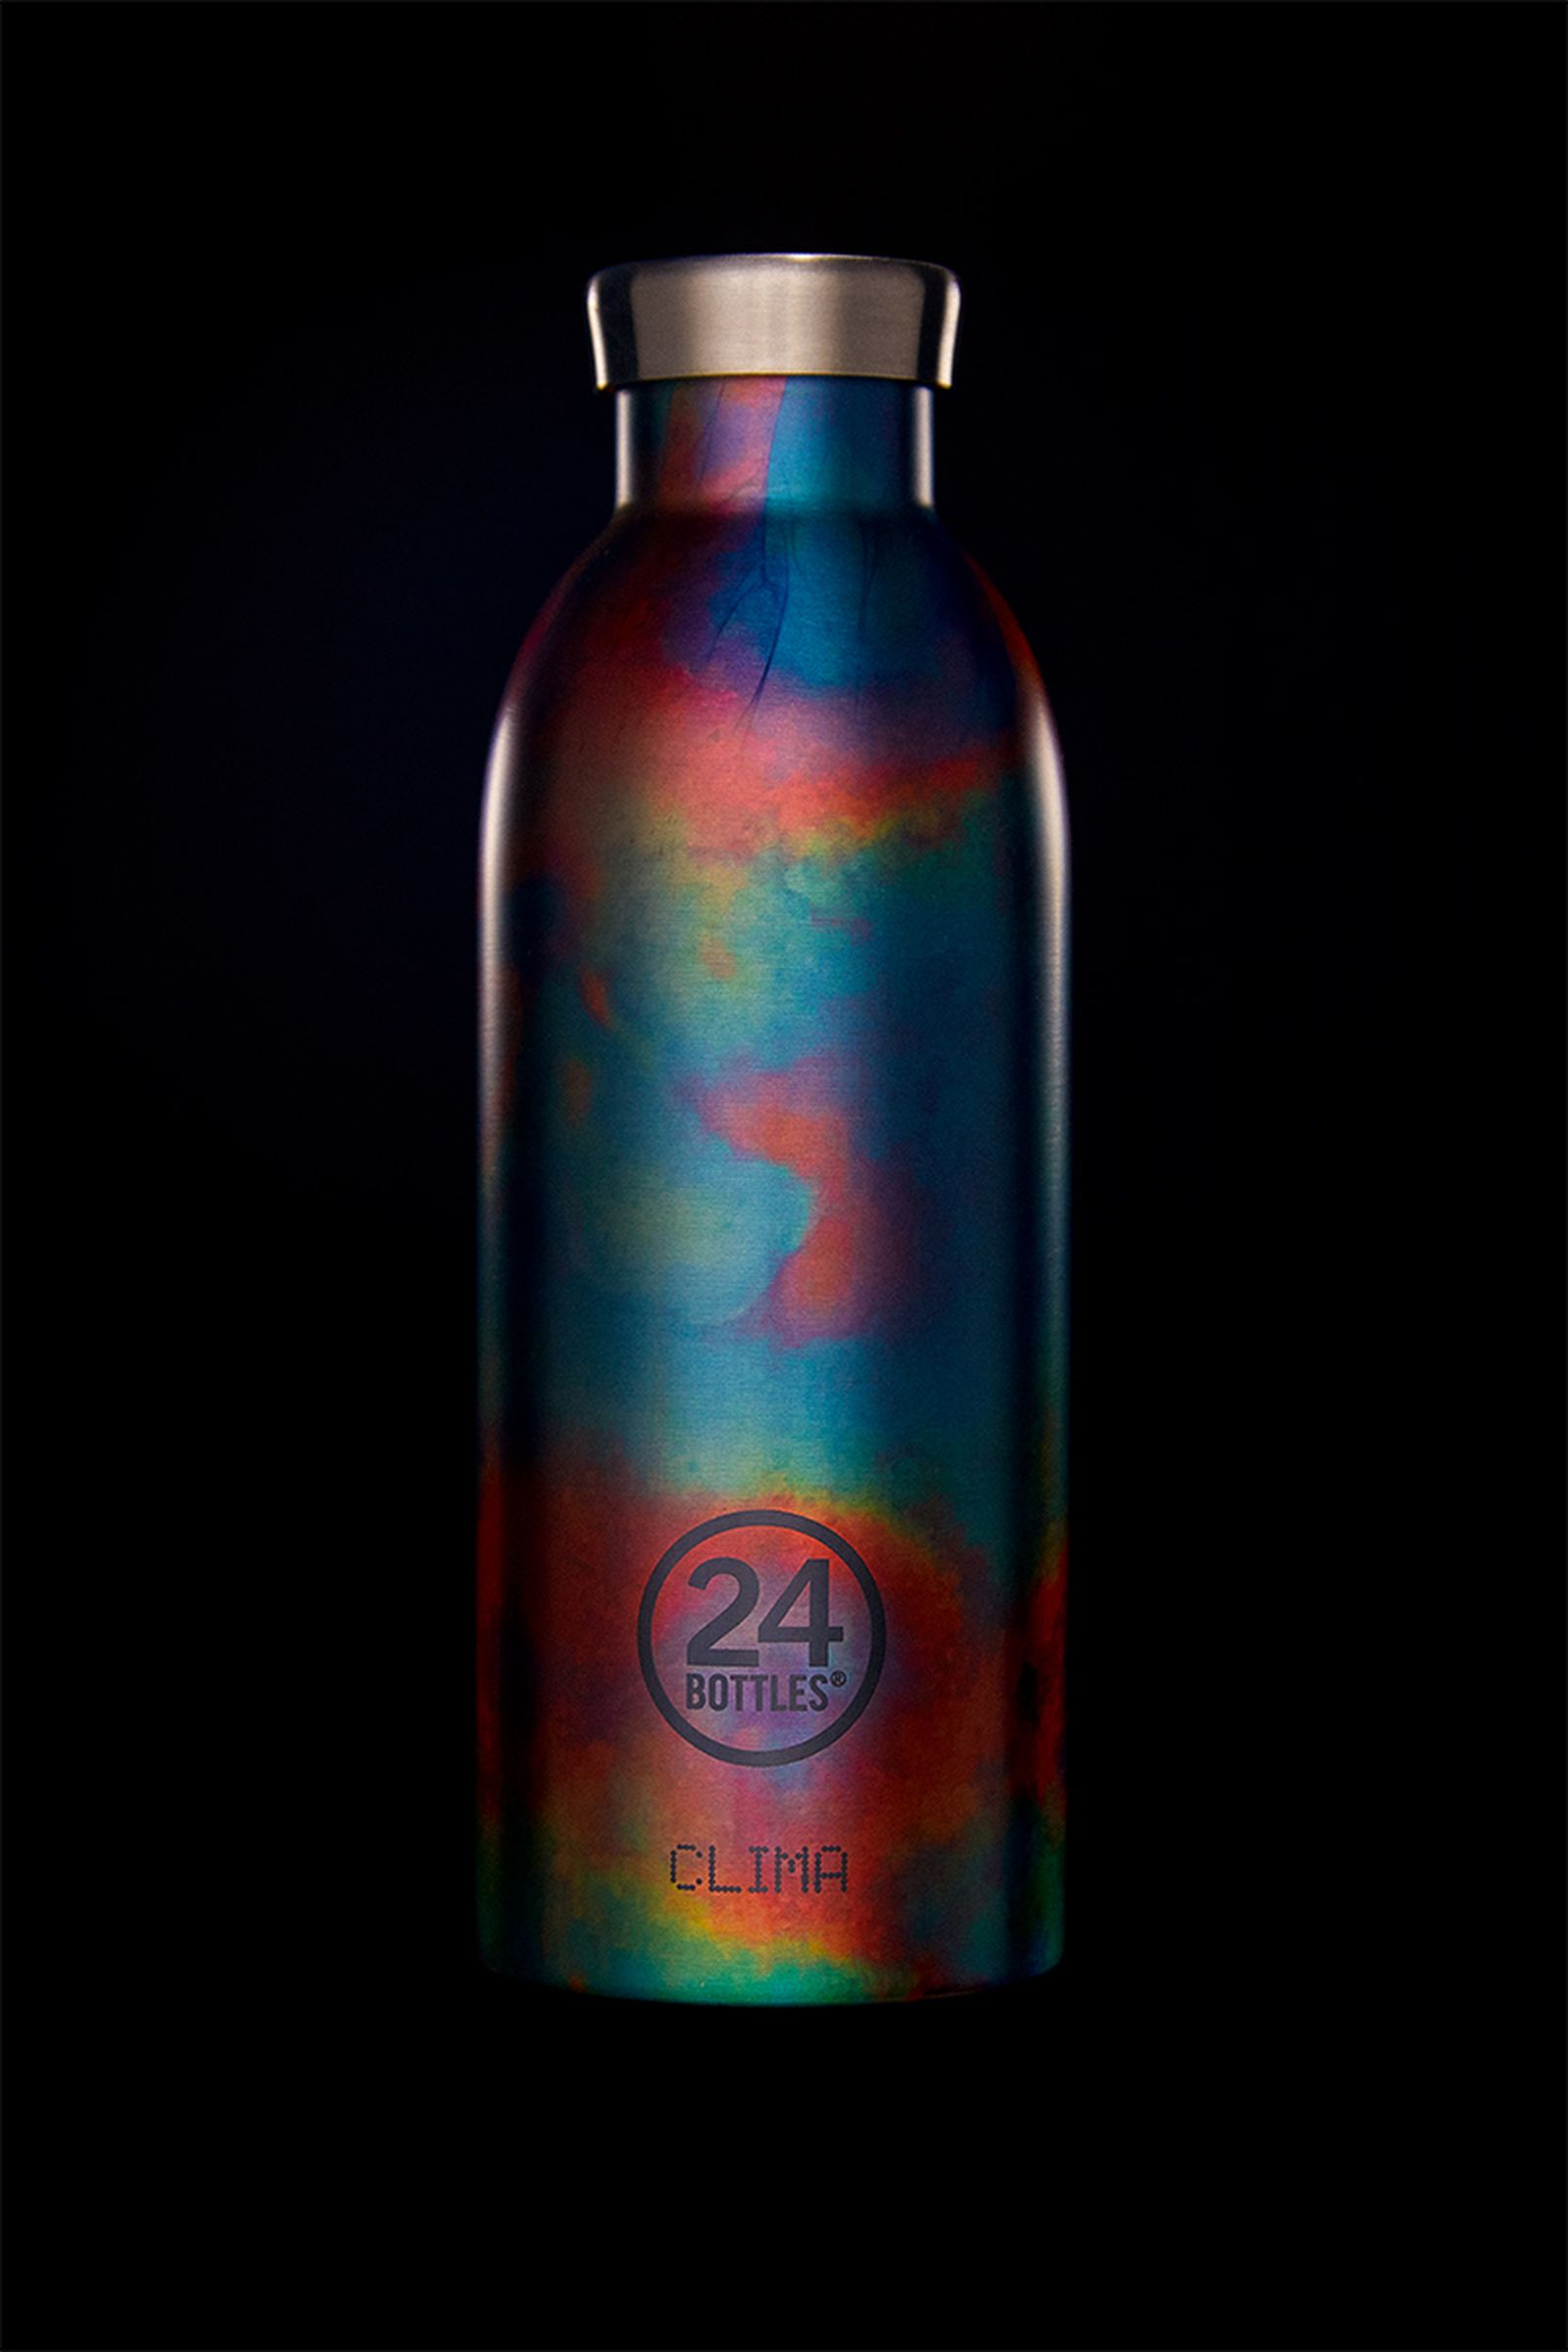 24-bottles-edit2